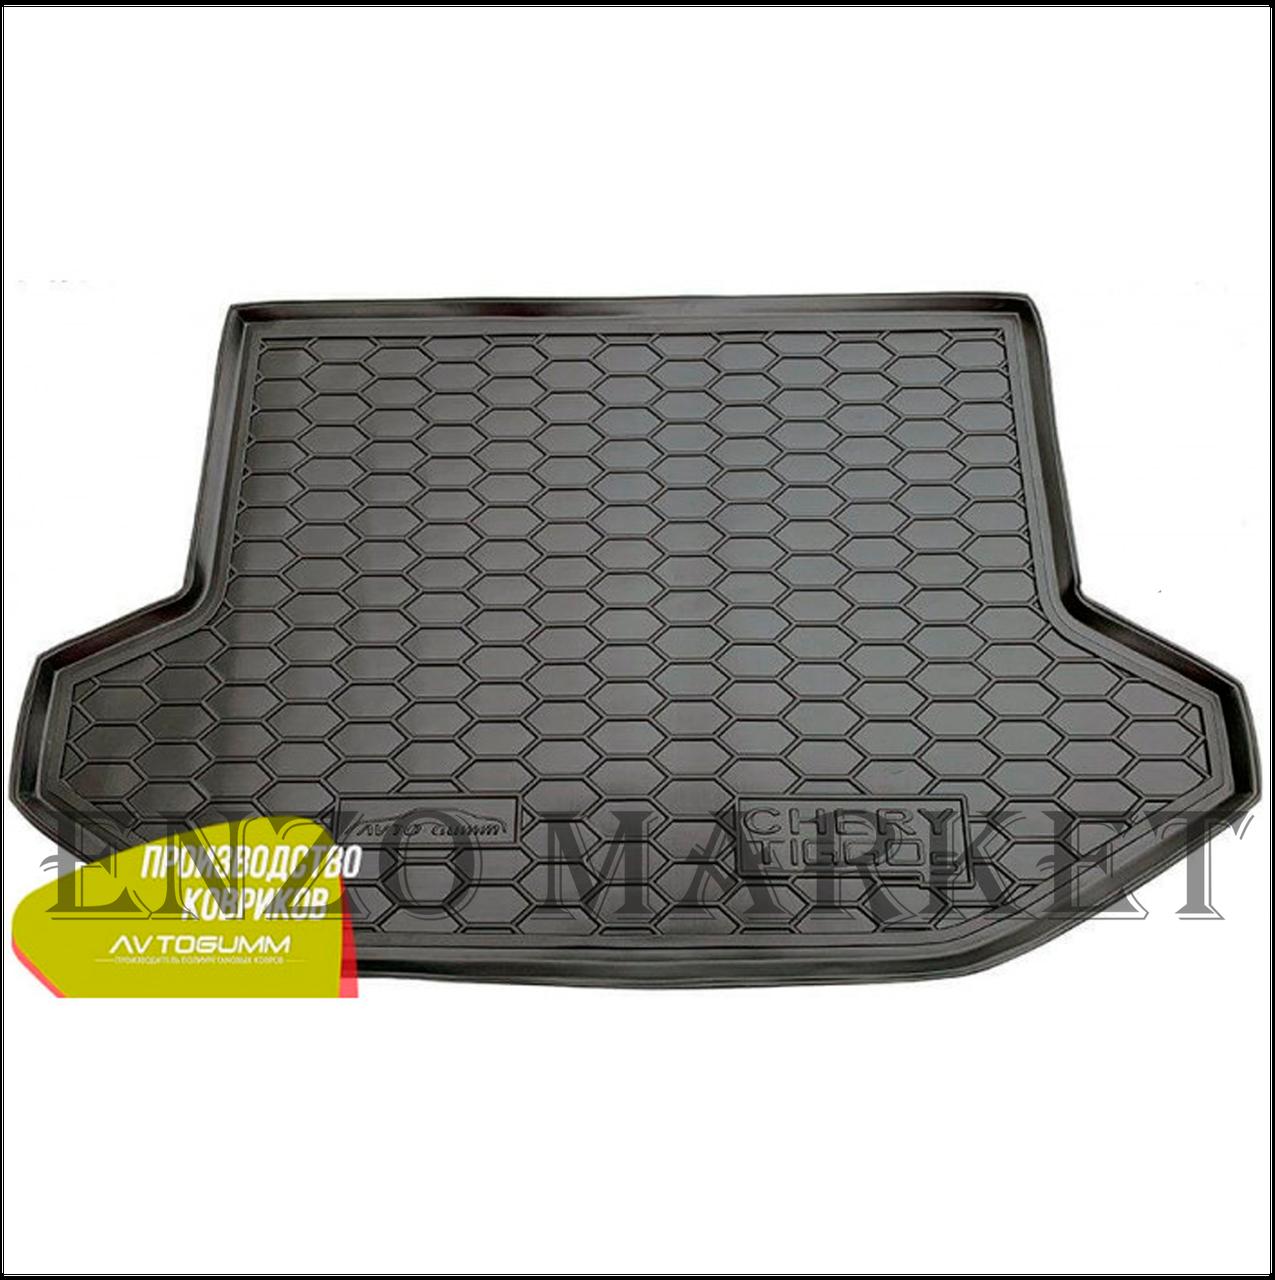 Автомобільний килимок в багажник Chery Tiggo 5 2015- (Avto-Gumm)